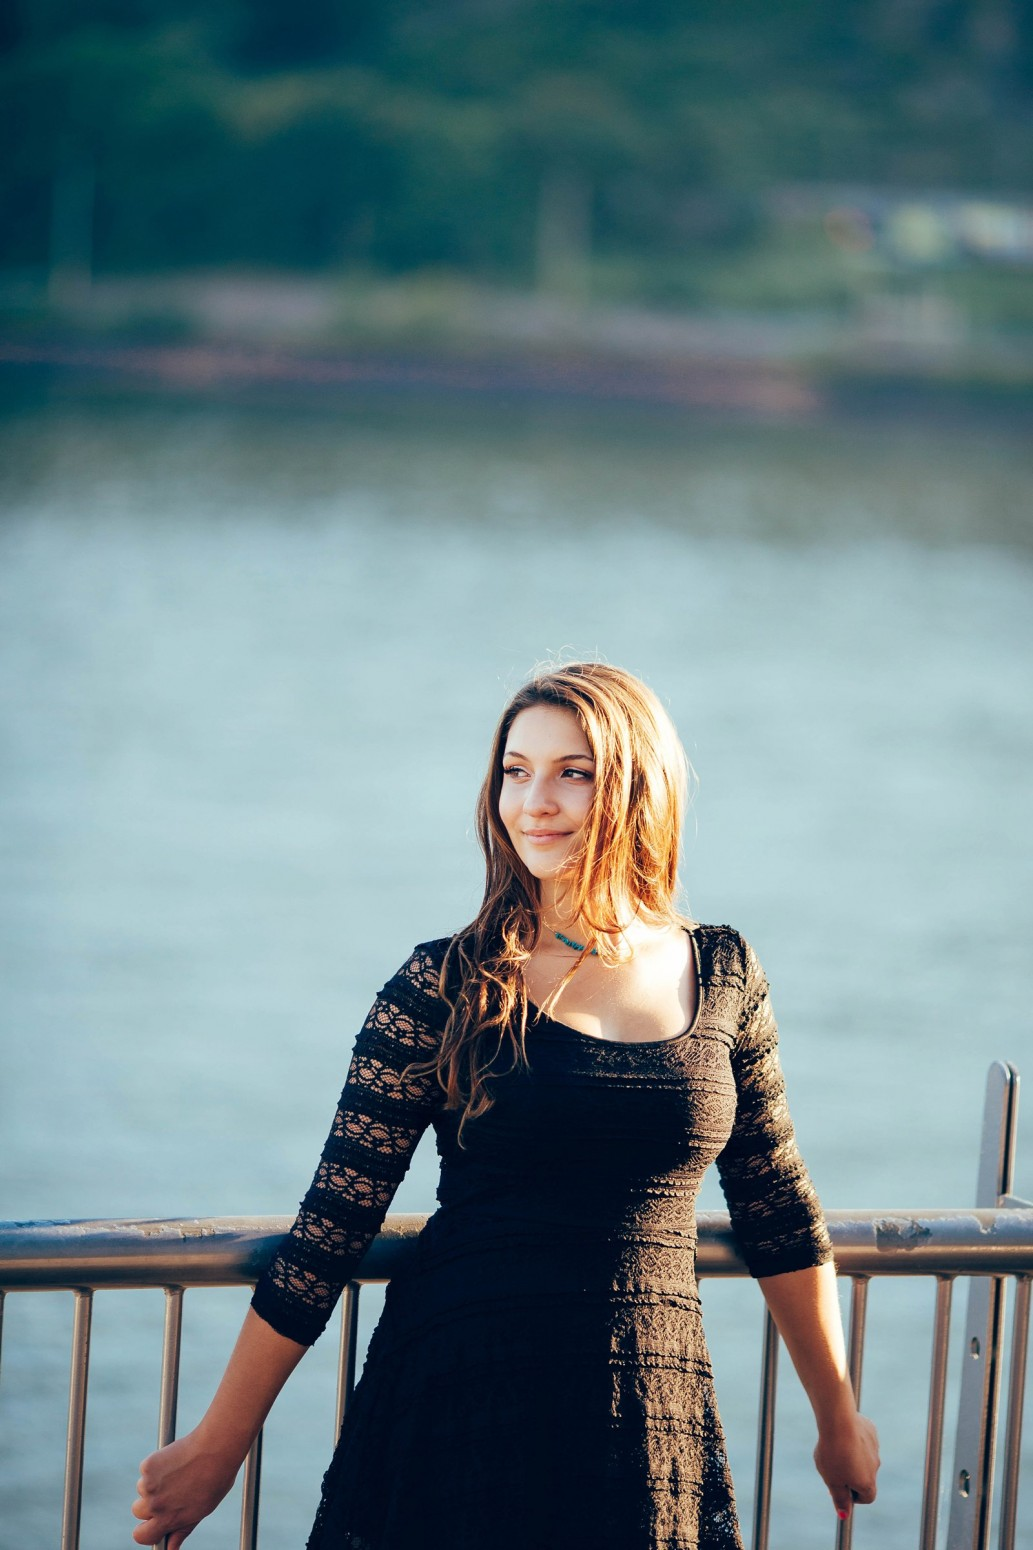 wild-native-photography-senior-portrait-photographer-pittsburgh-nadia_0172